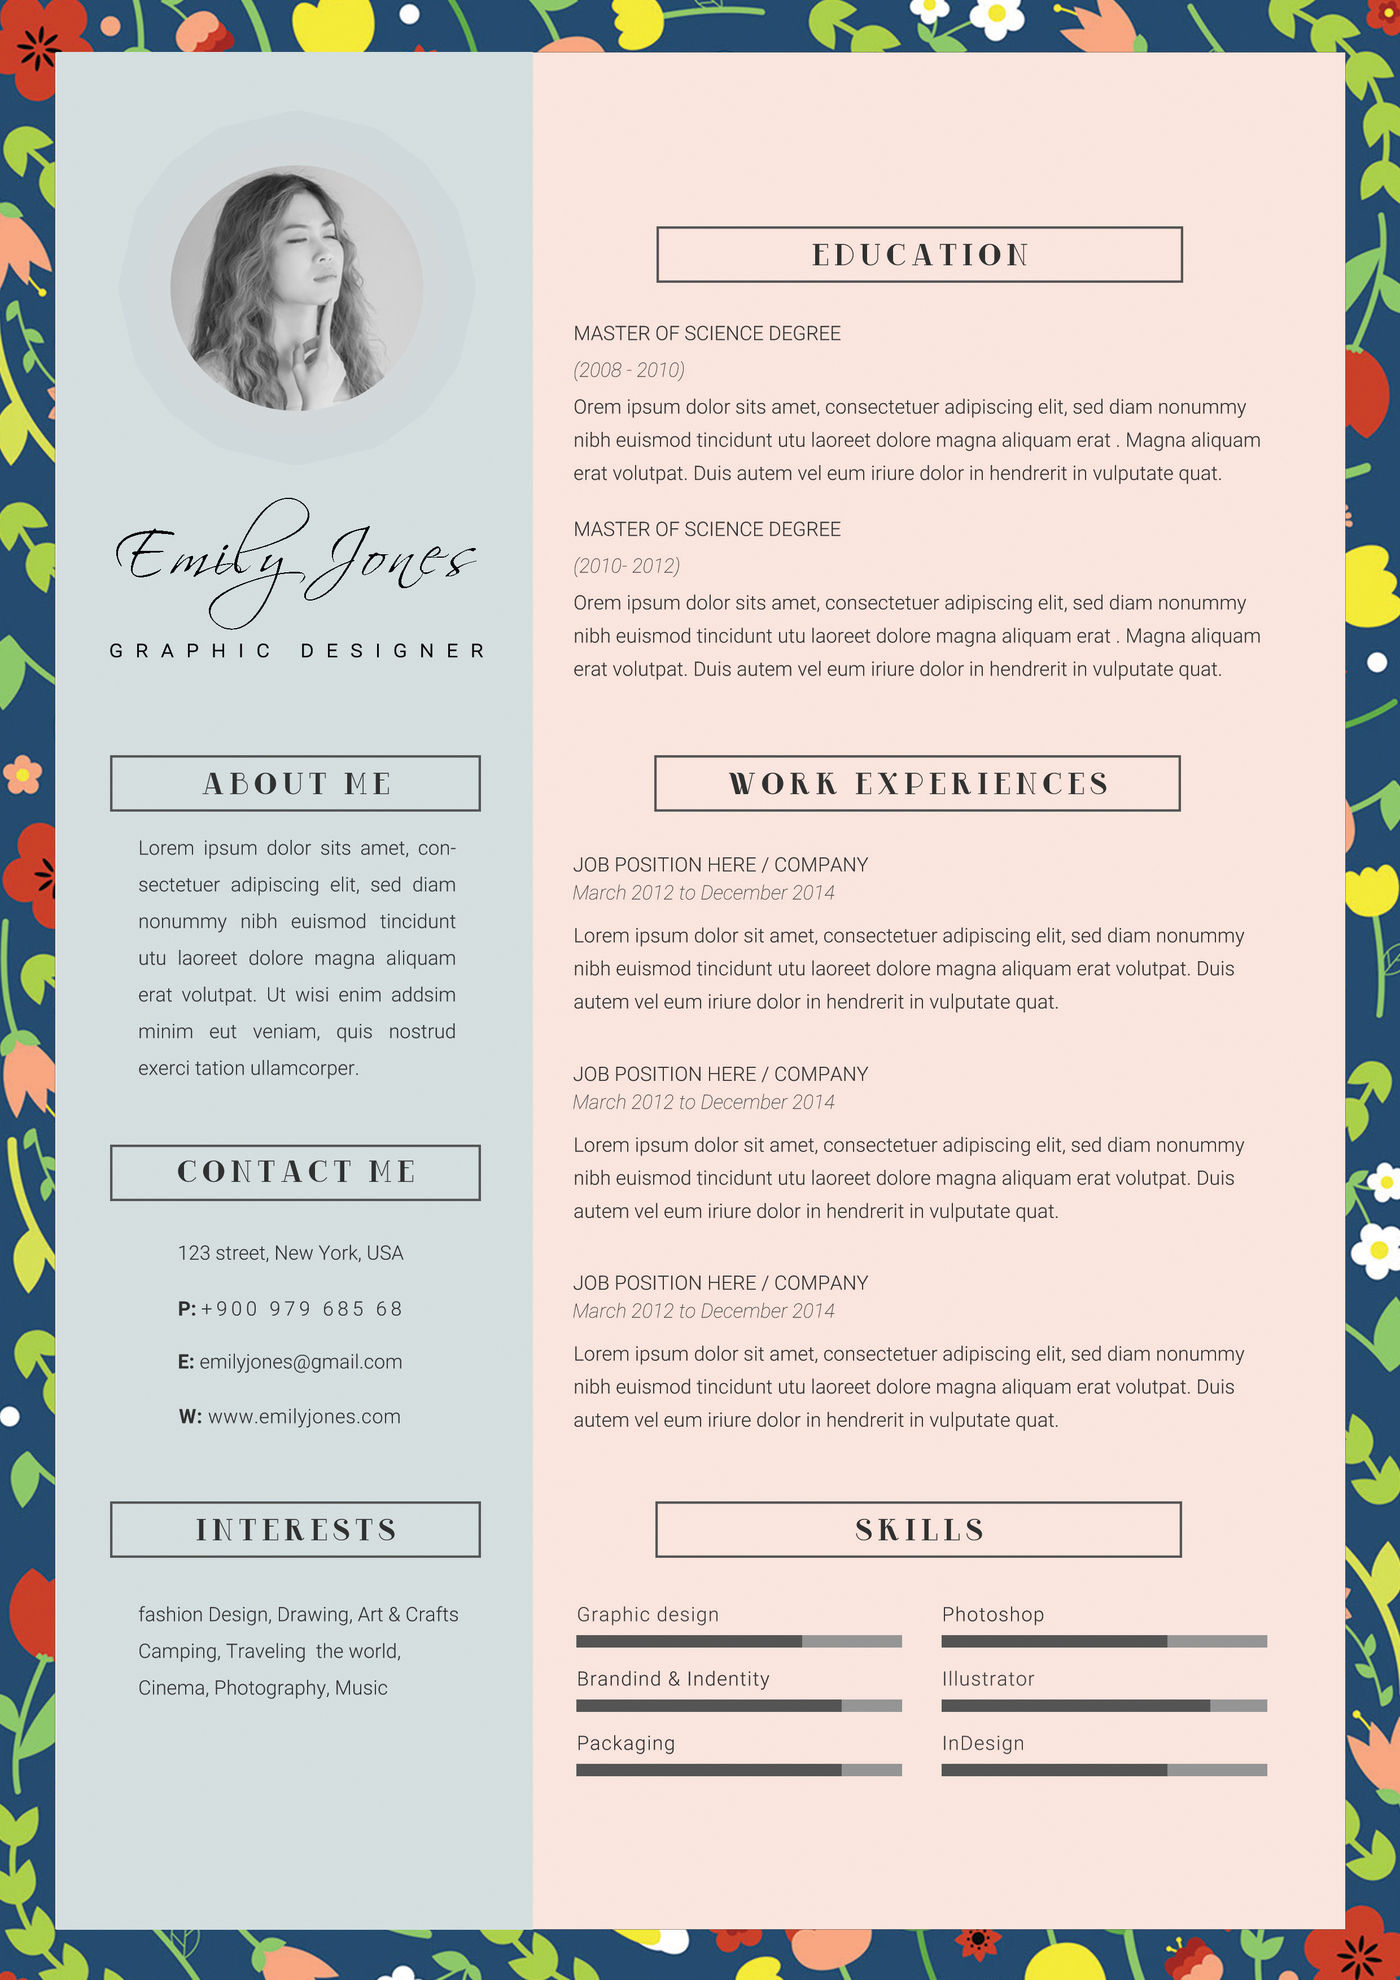 floral pattern resume template  cv